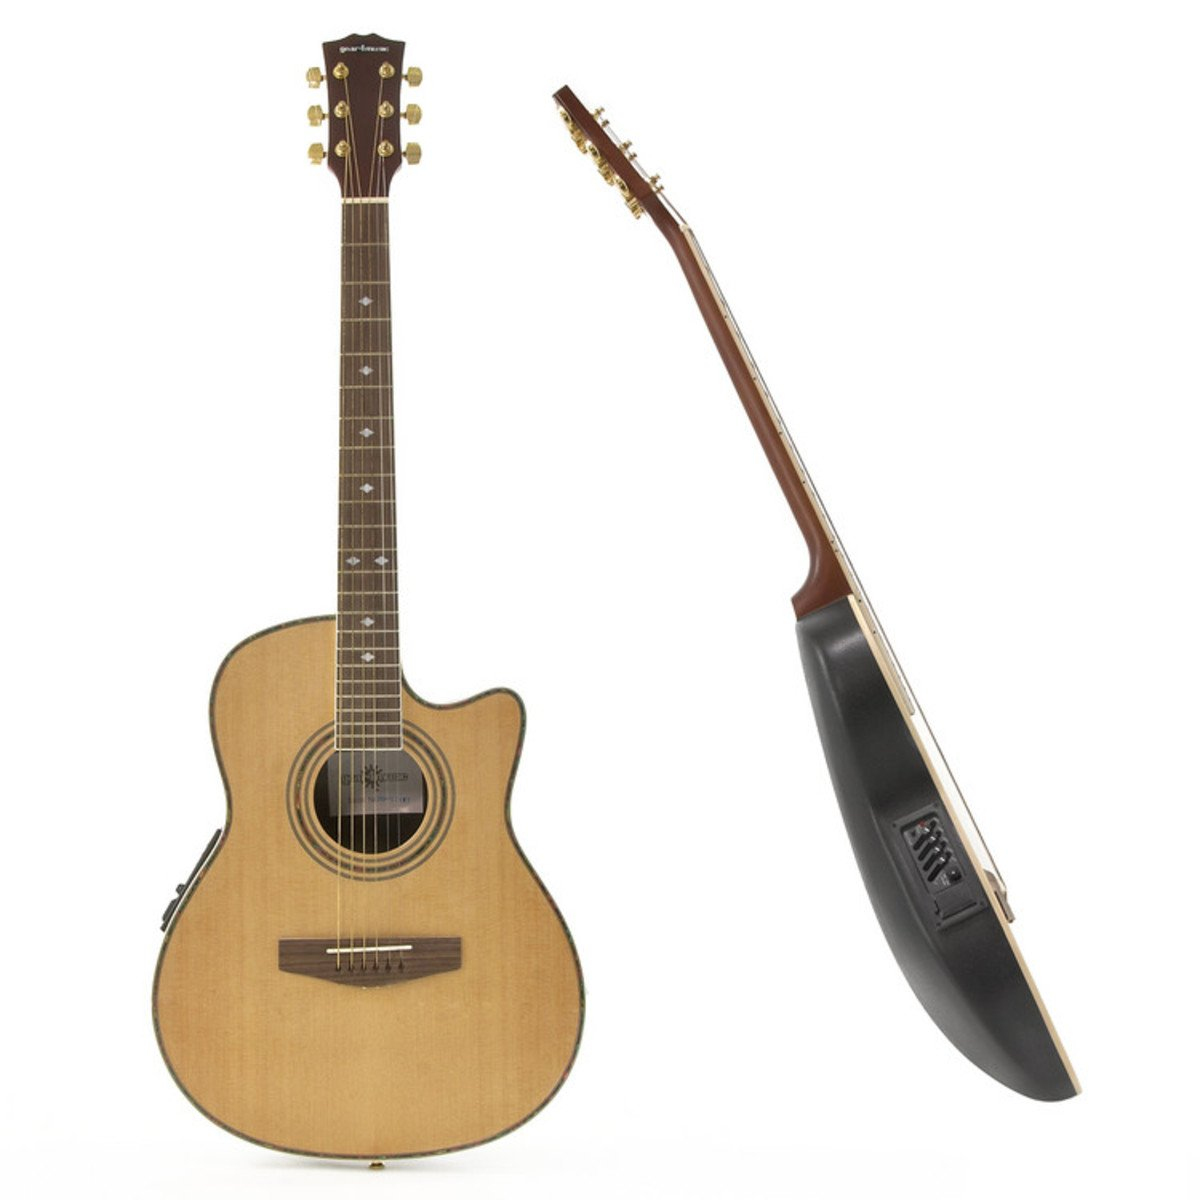 Guitarra Electroacústica de Tapa Trasera Redonda + Pack con Ampli de 15W Natural: Amazon.es: Instrumentos musicales